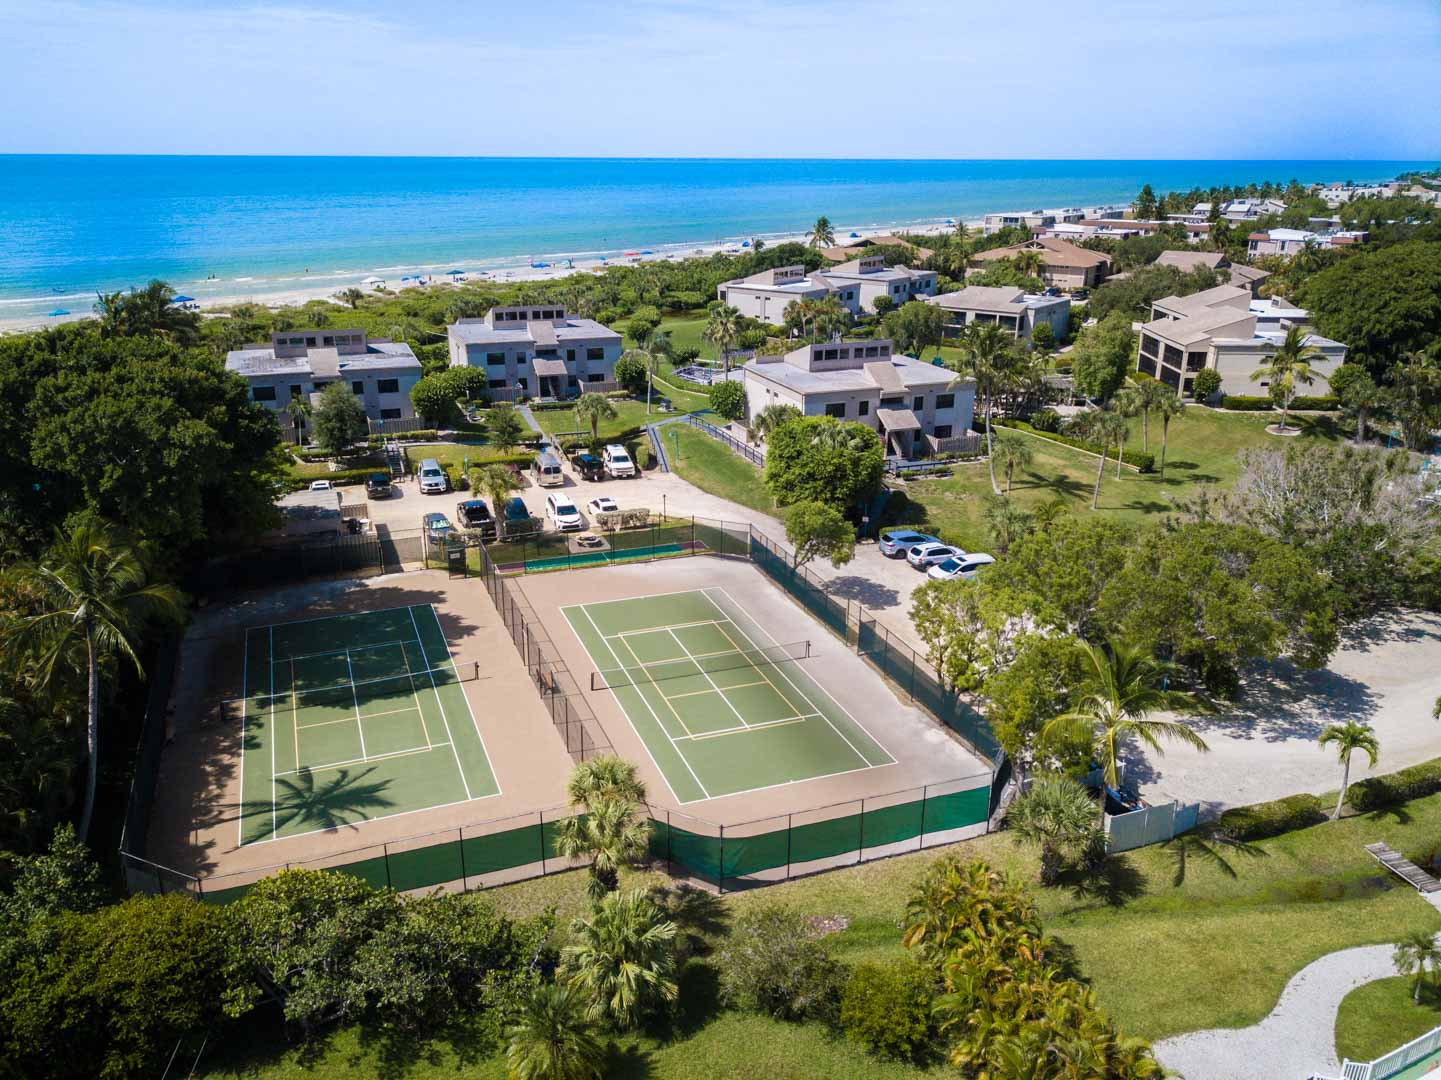 Sanibel Beach Club Pool